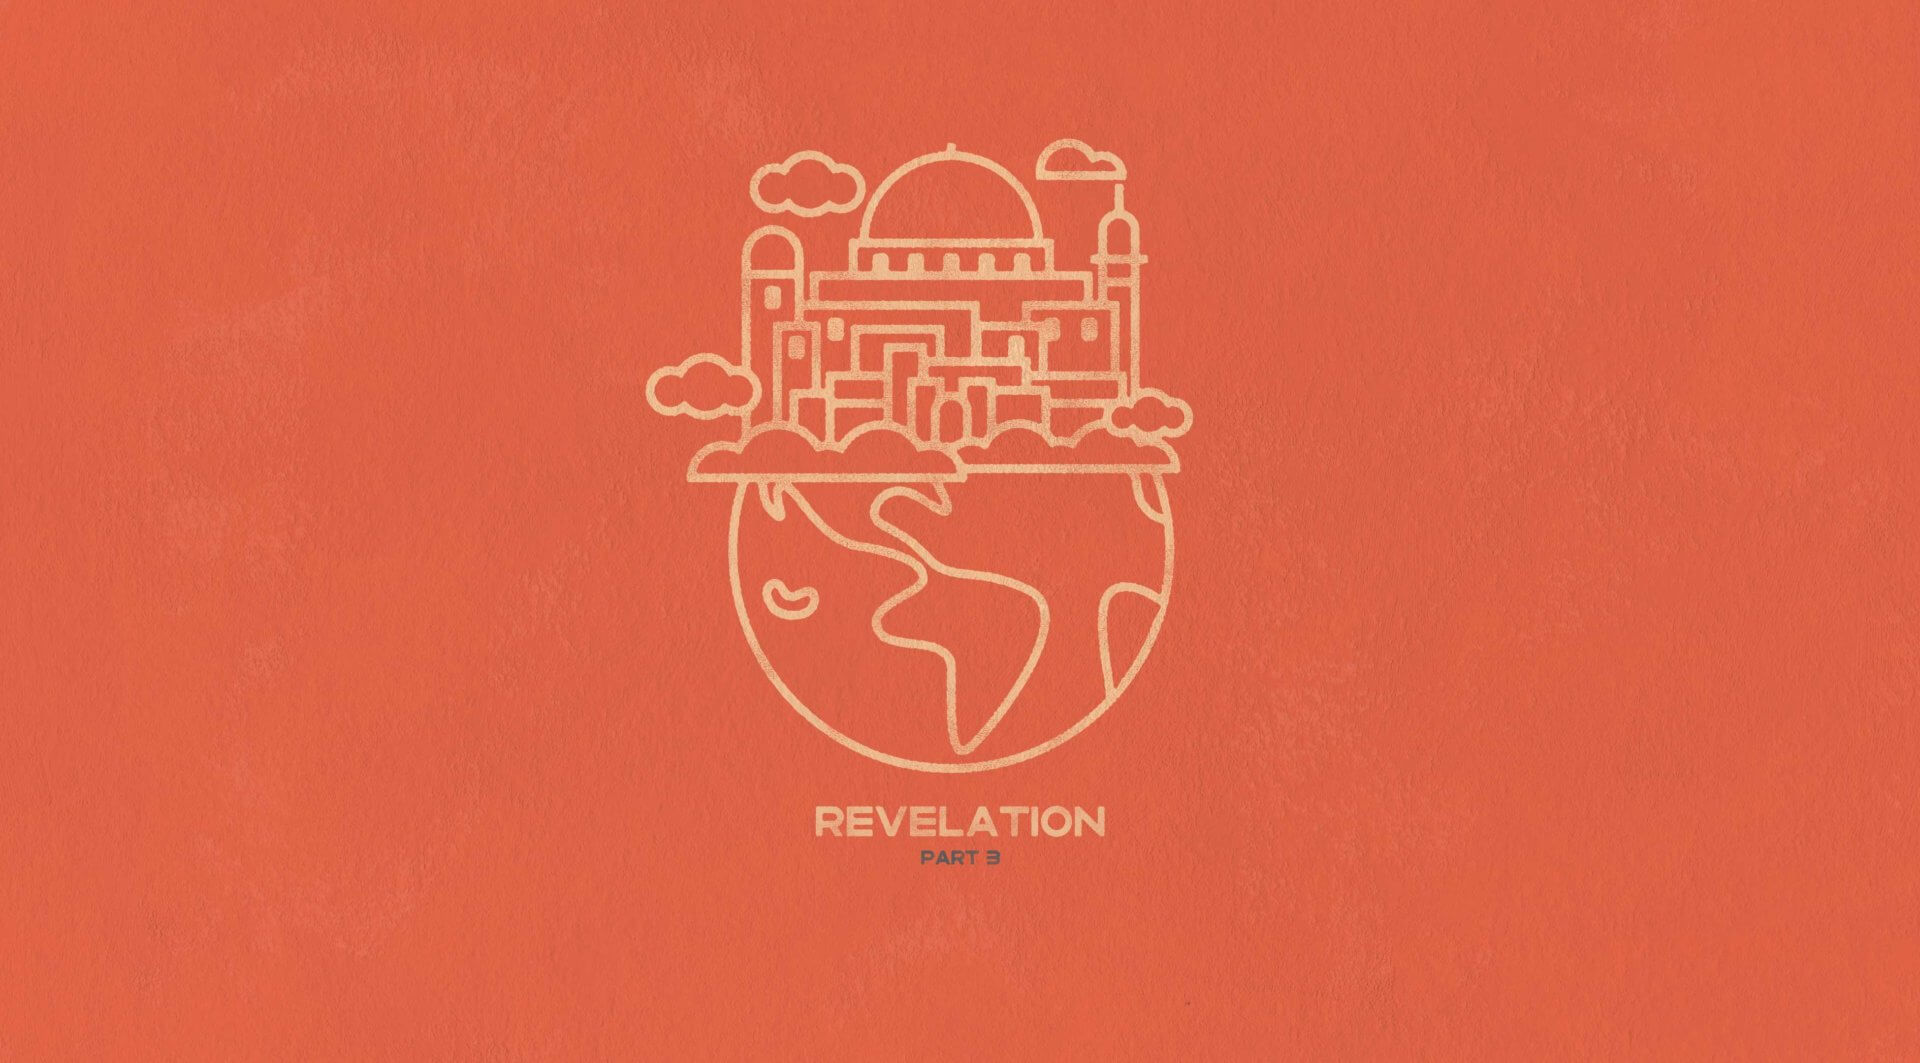 Revelation - Part 3